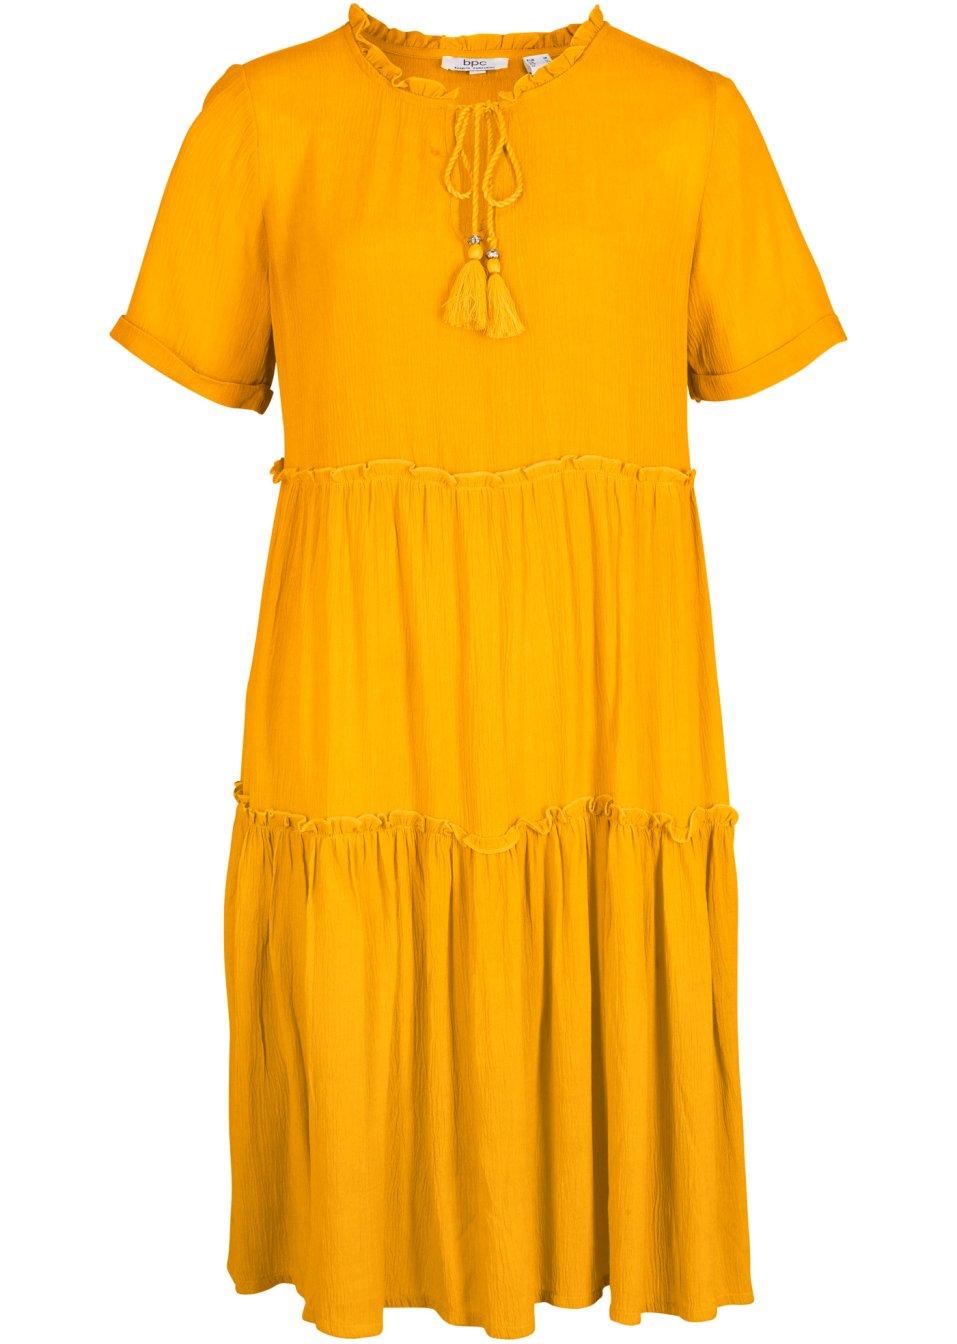 Figurumspielendes Crinkle-Kleid im Kaftan-Look mit Volants - safrangelb R9l3q c0cko